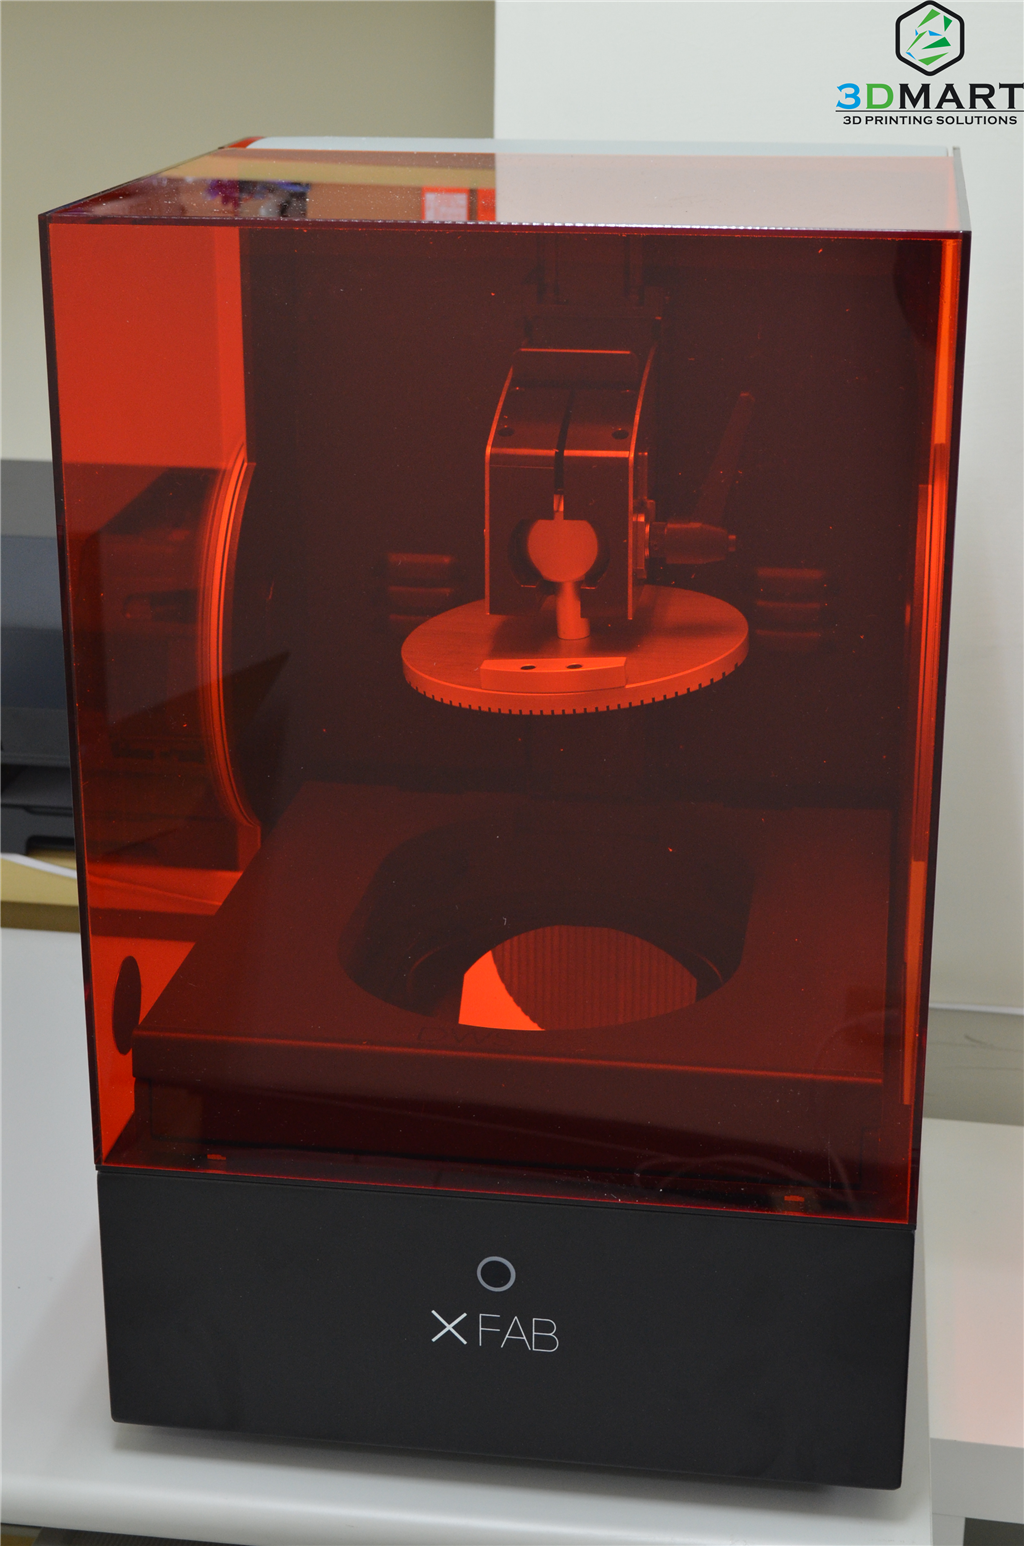 3DMART 引進 DWS 高級桌上型 SLA 光固化 3D列印機  - XFAB在三帝瑪辦公室首次亮相